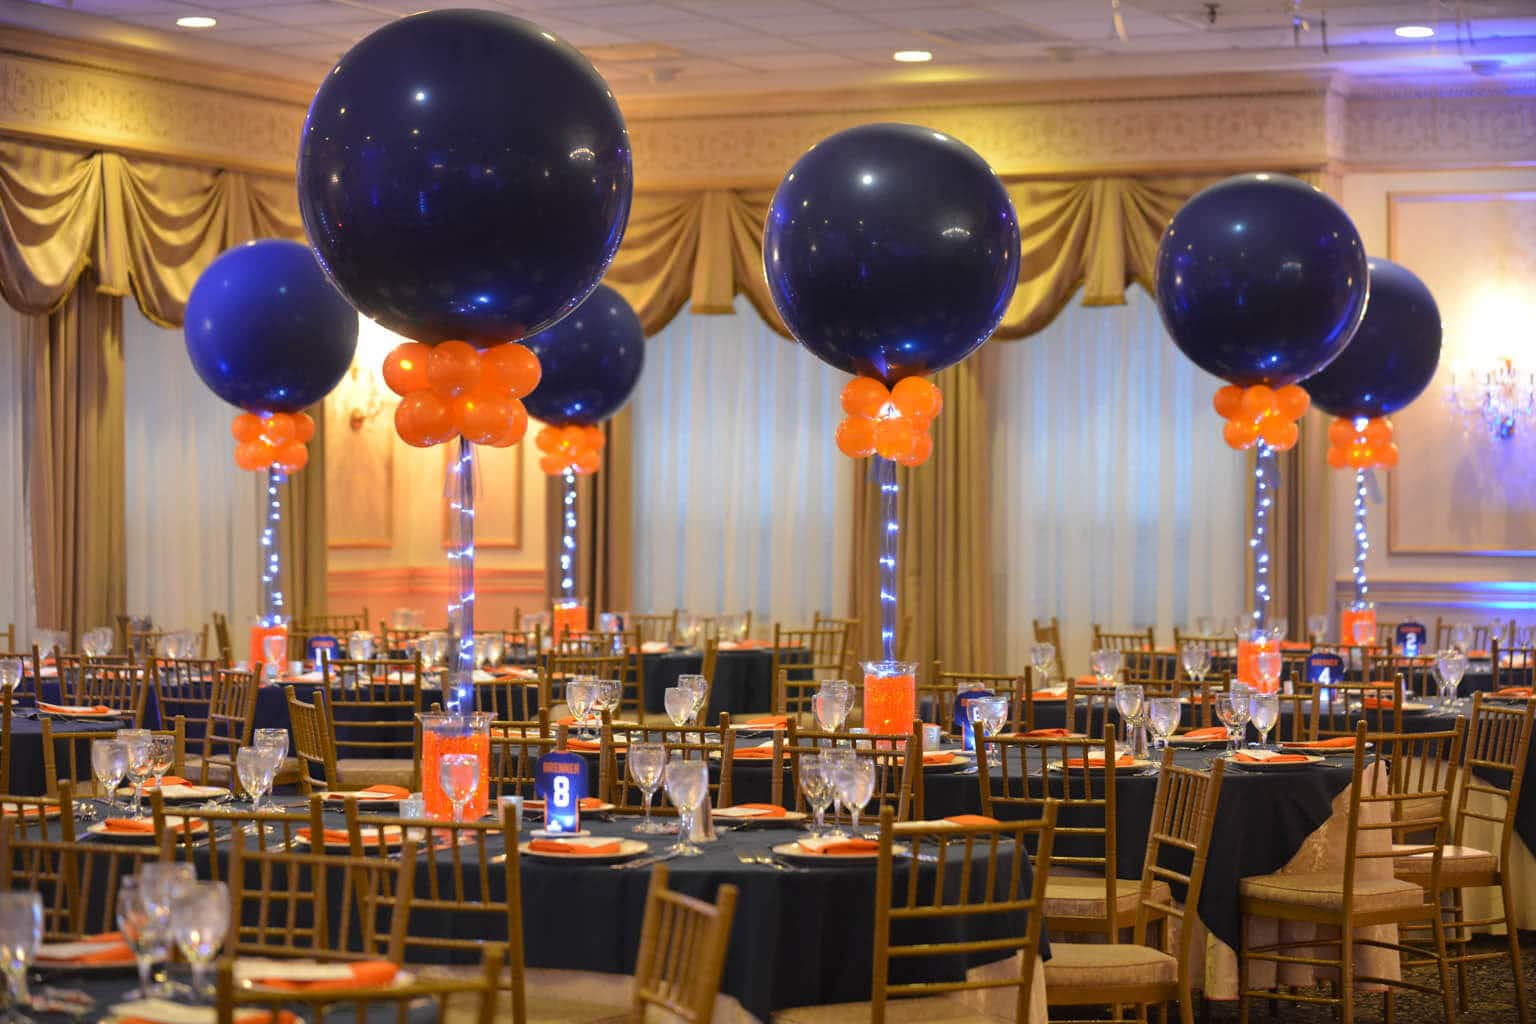 Aqua gems centerpieces balloon artistry for Orange centerpieces for tables